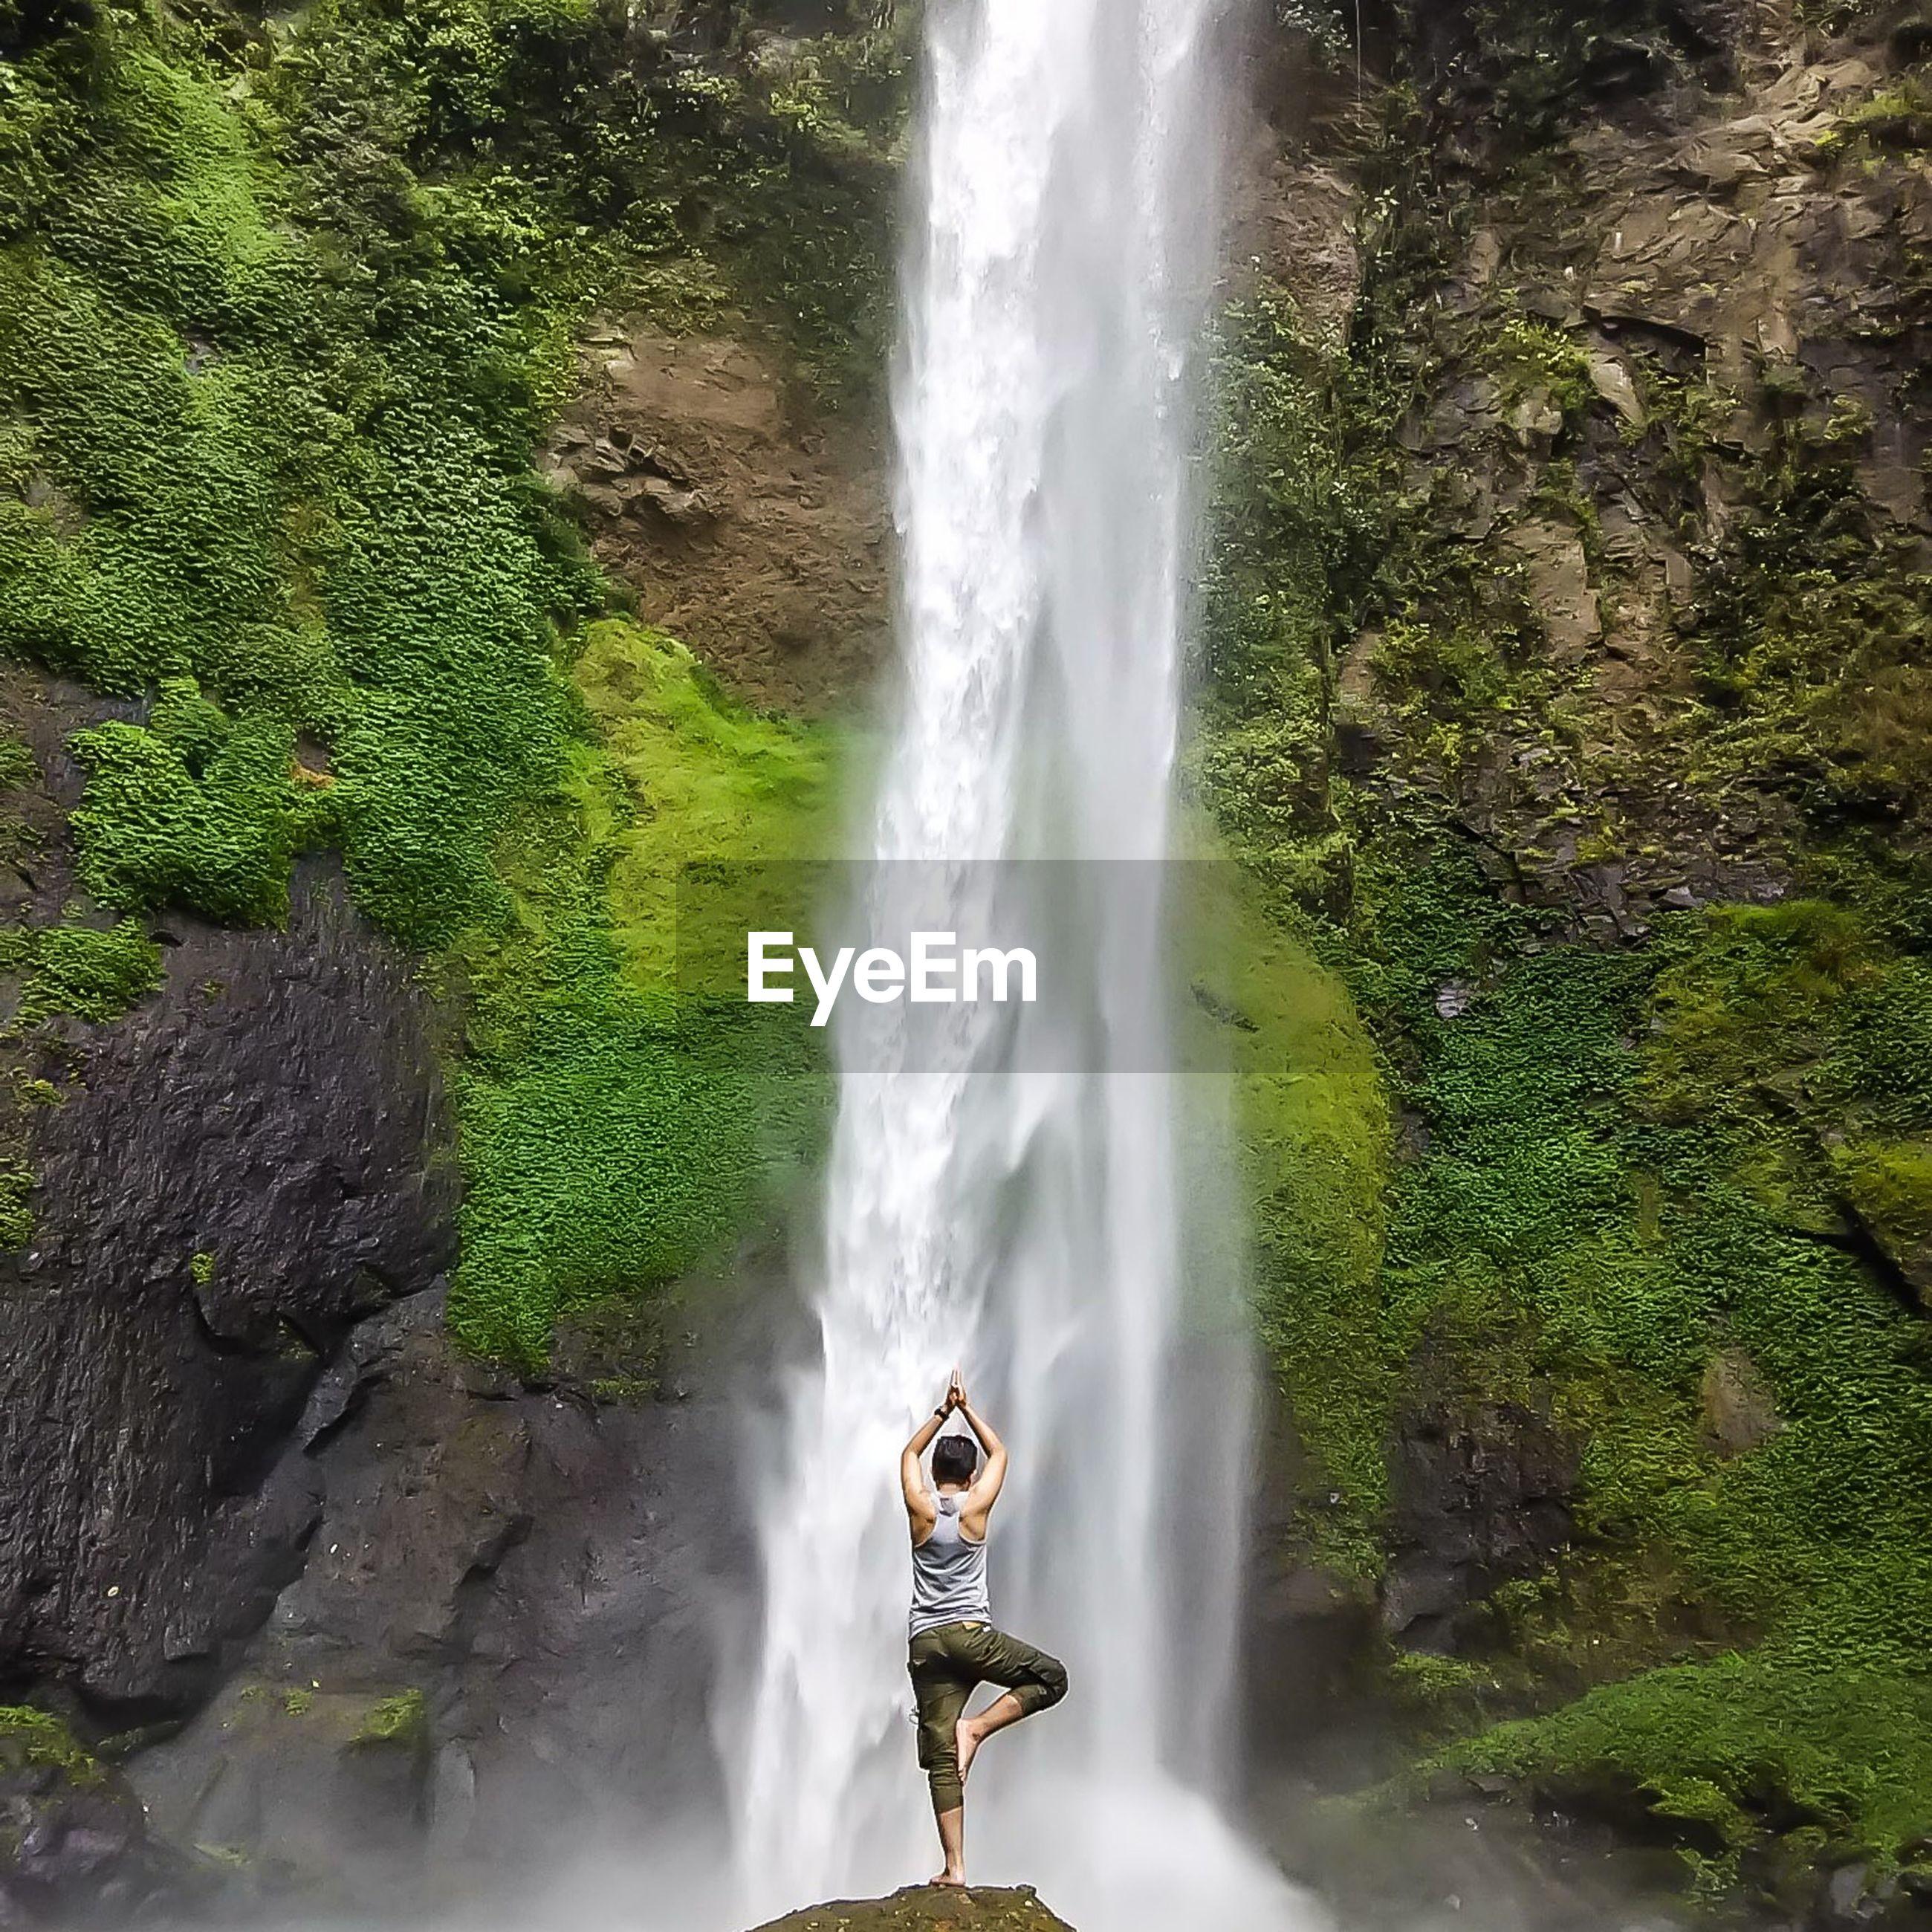 Full length rear view of man performing yoga against waterfall